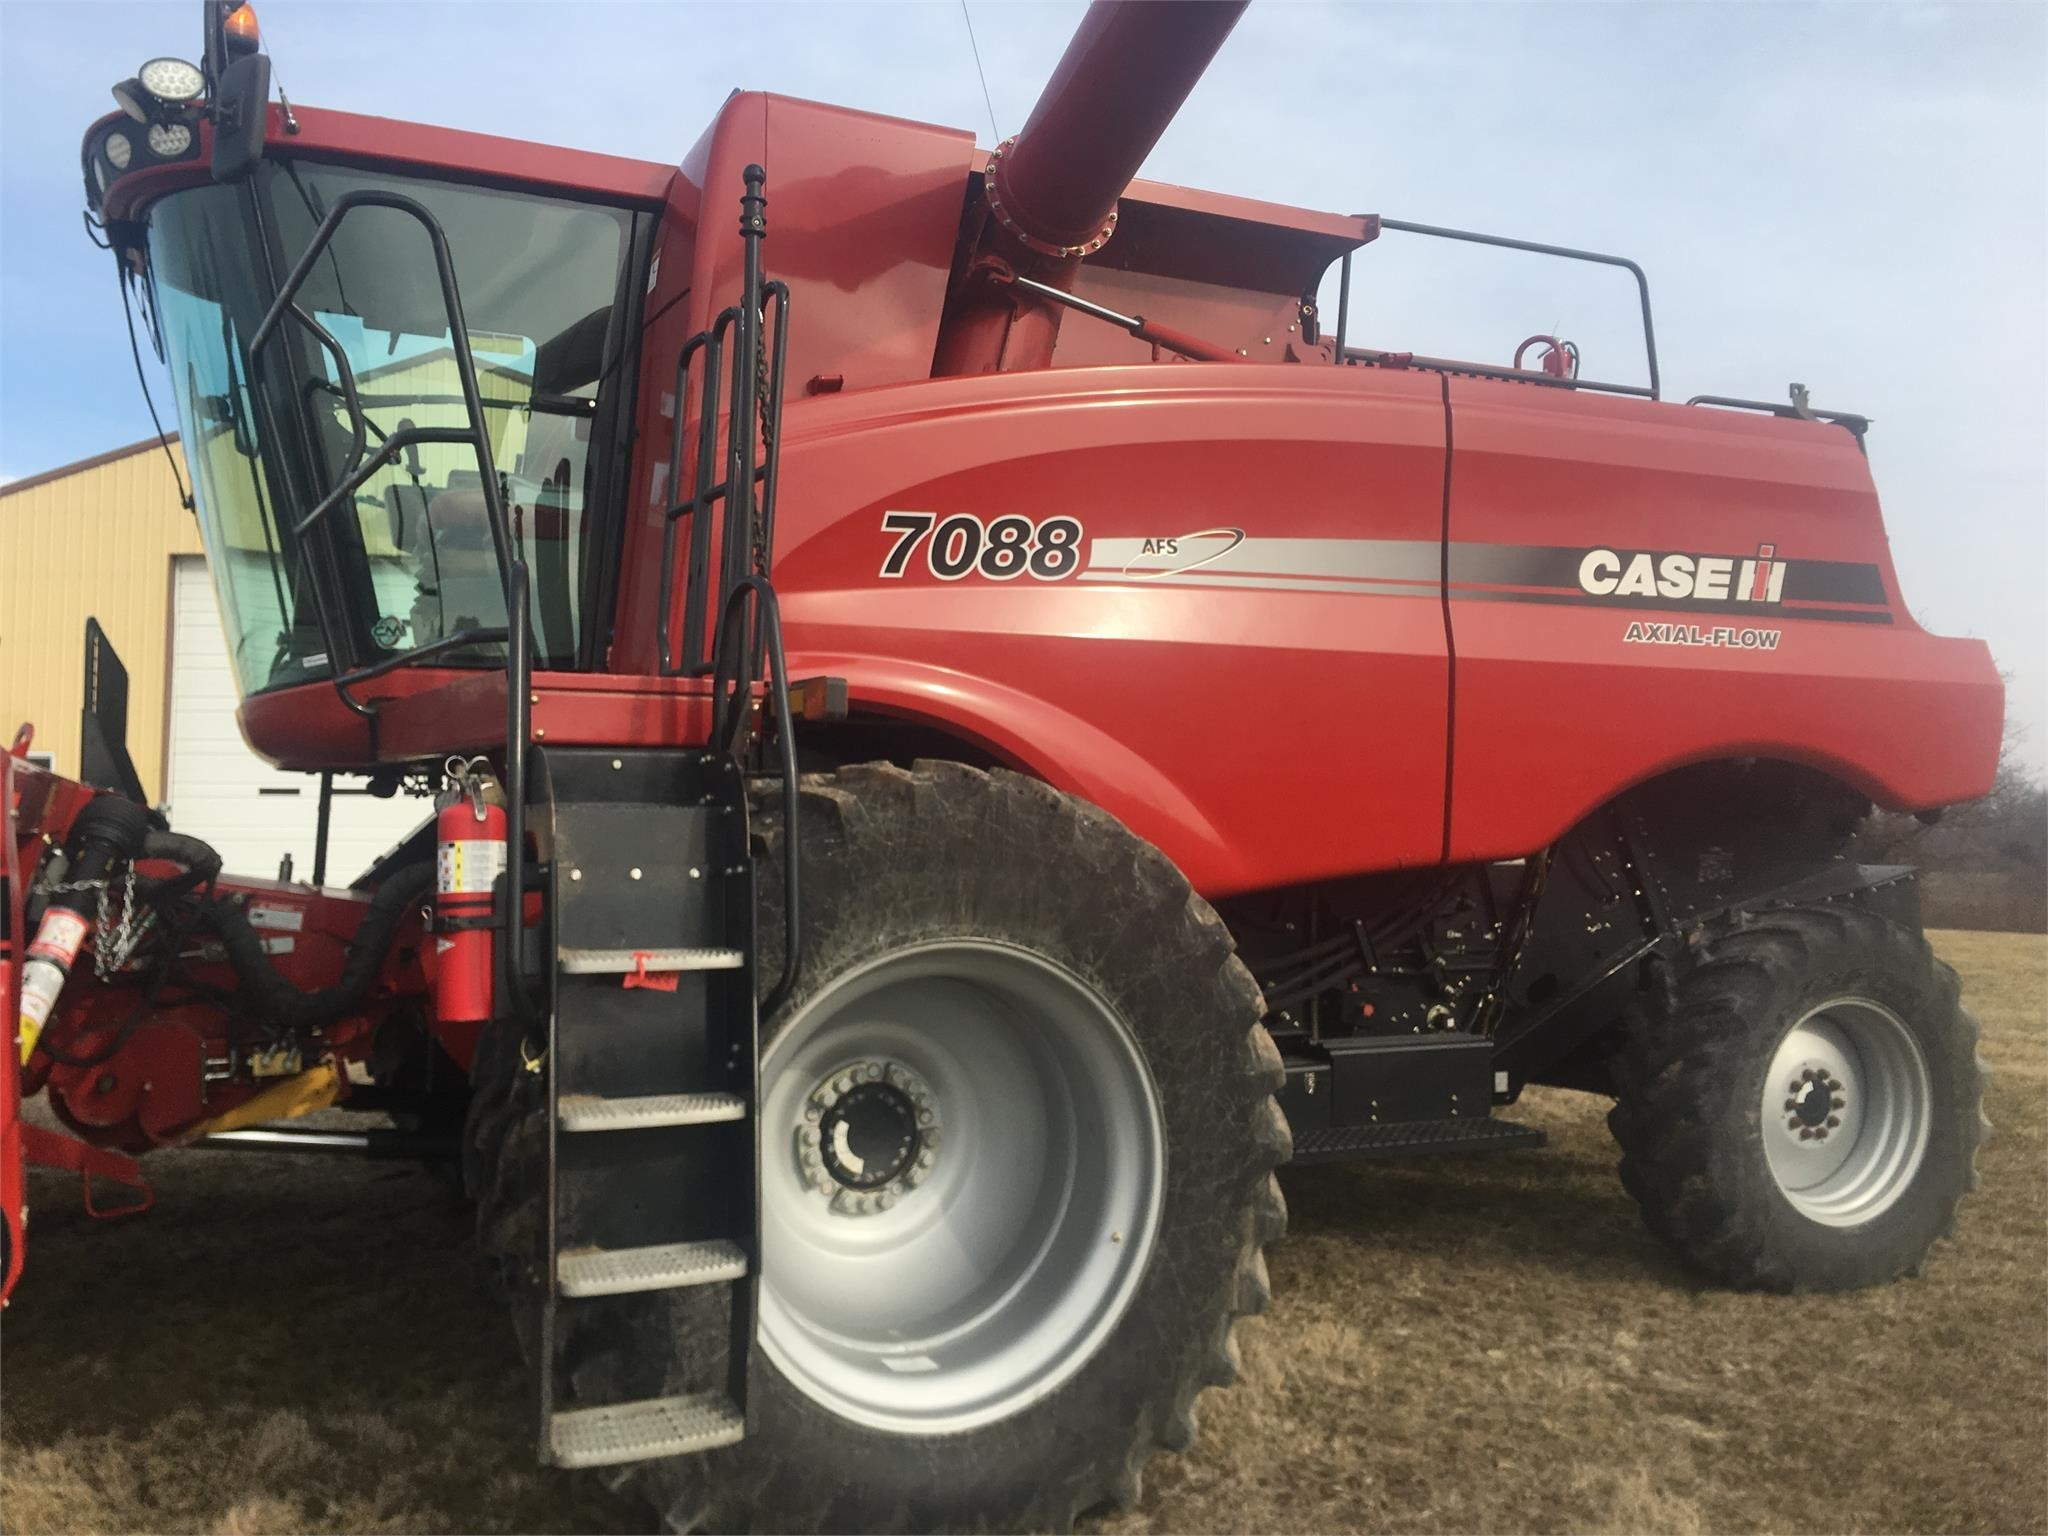 2011 Case IH 7088 Combine